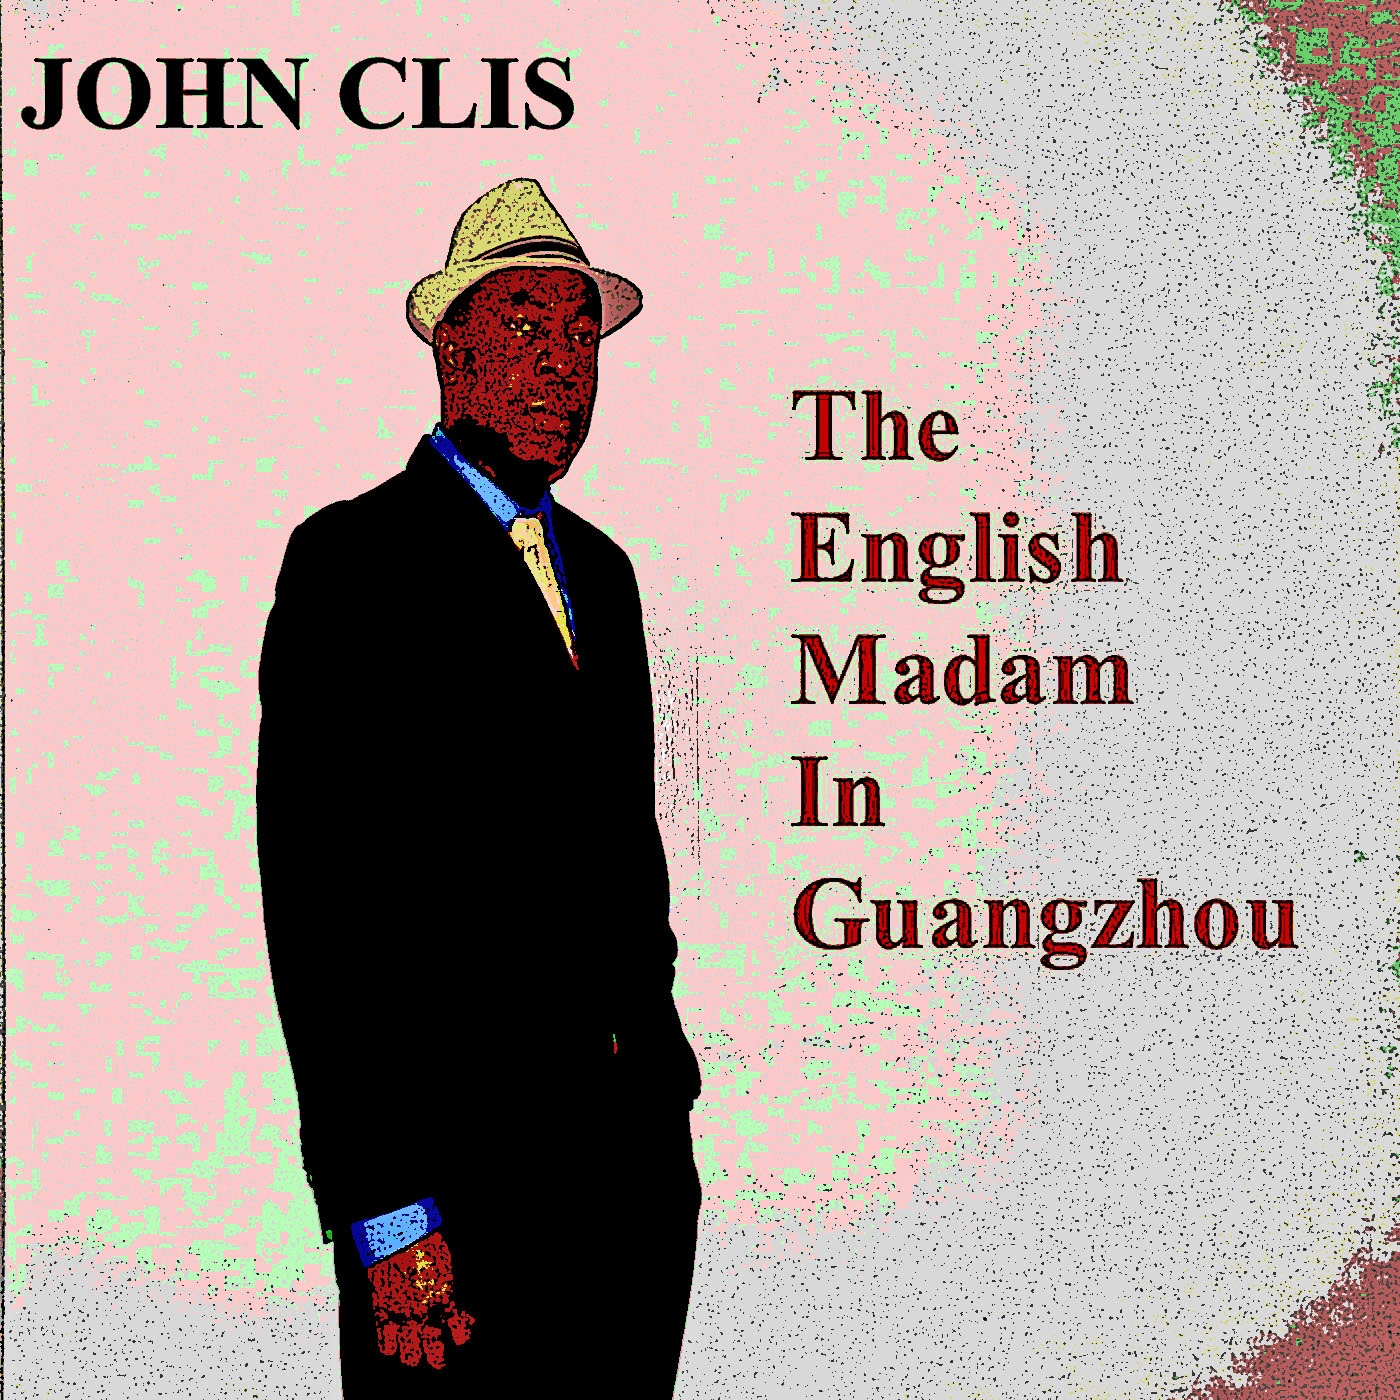 https://0201.nccdn.net/1_2/000/000/090/9a8/JOHN-CLIS-7TH-CD-1400x1400.jpg